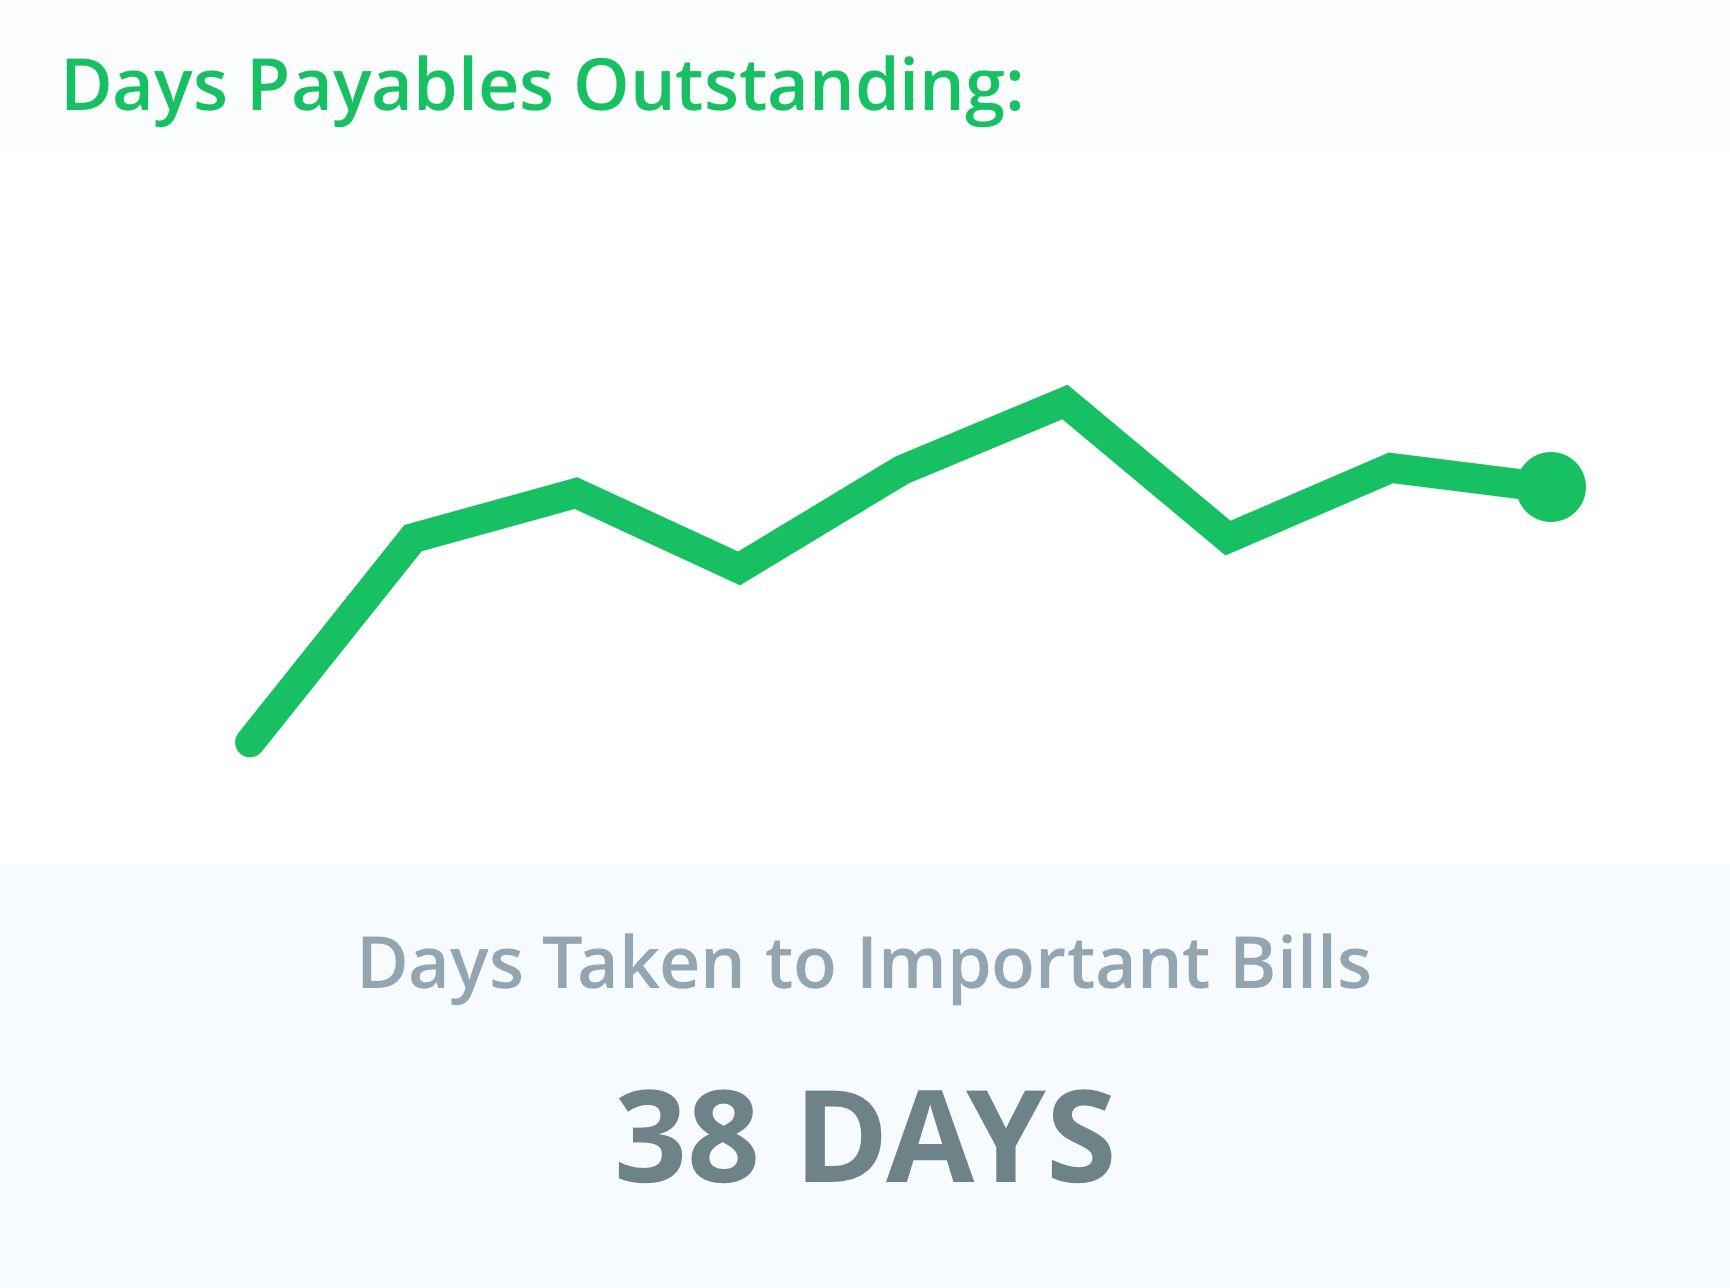 Days Payables Outstanding - Balance Sheet Metrics